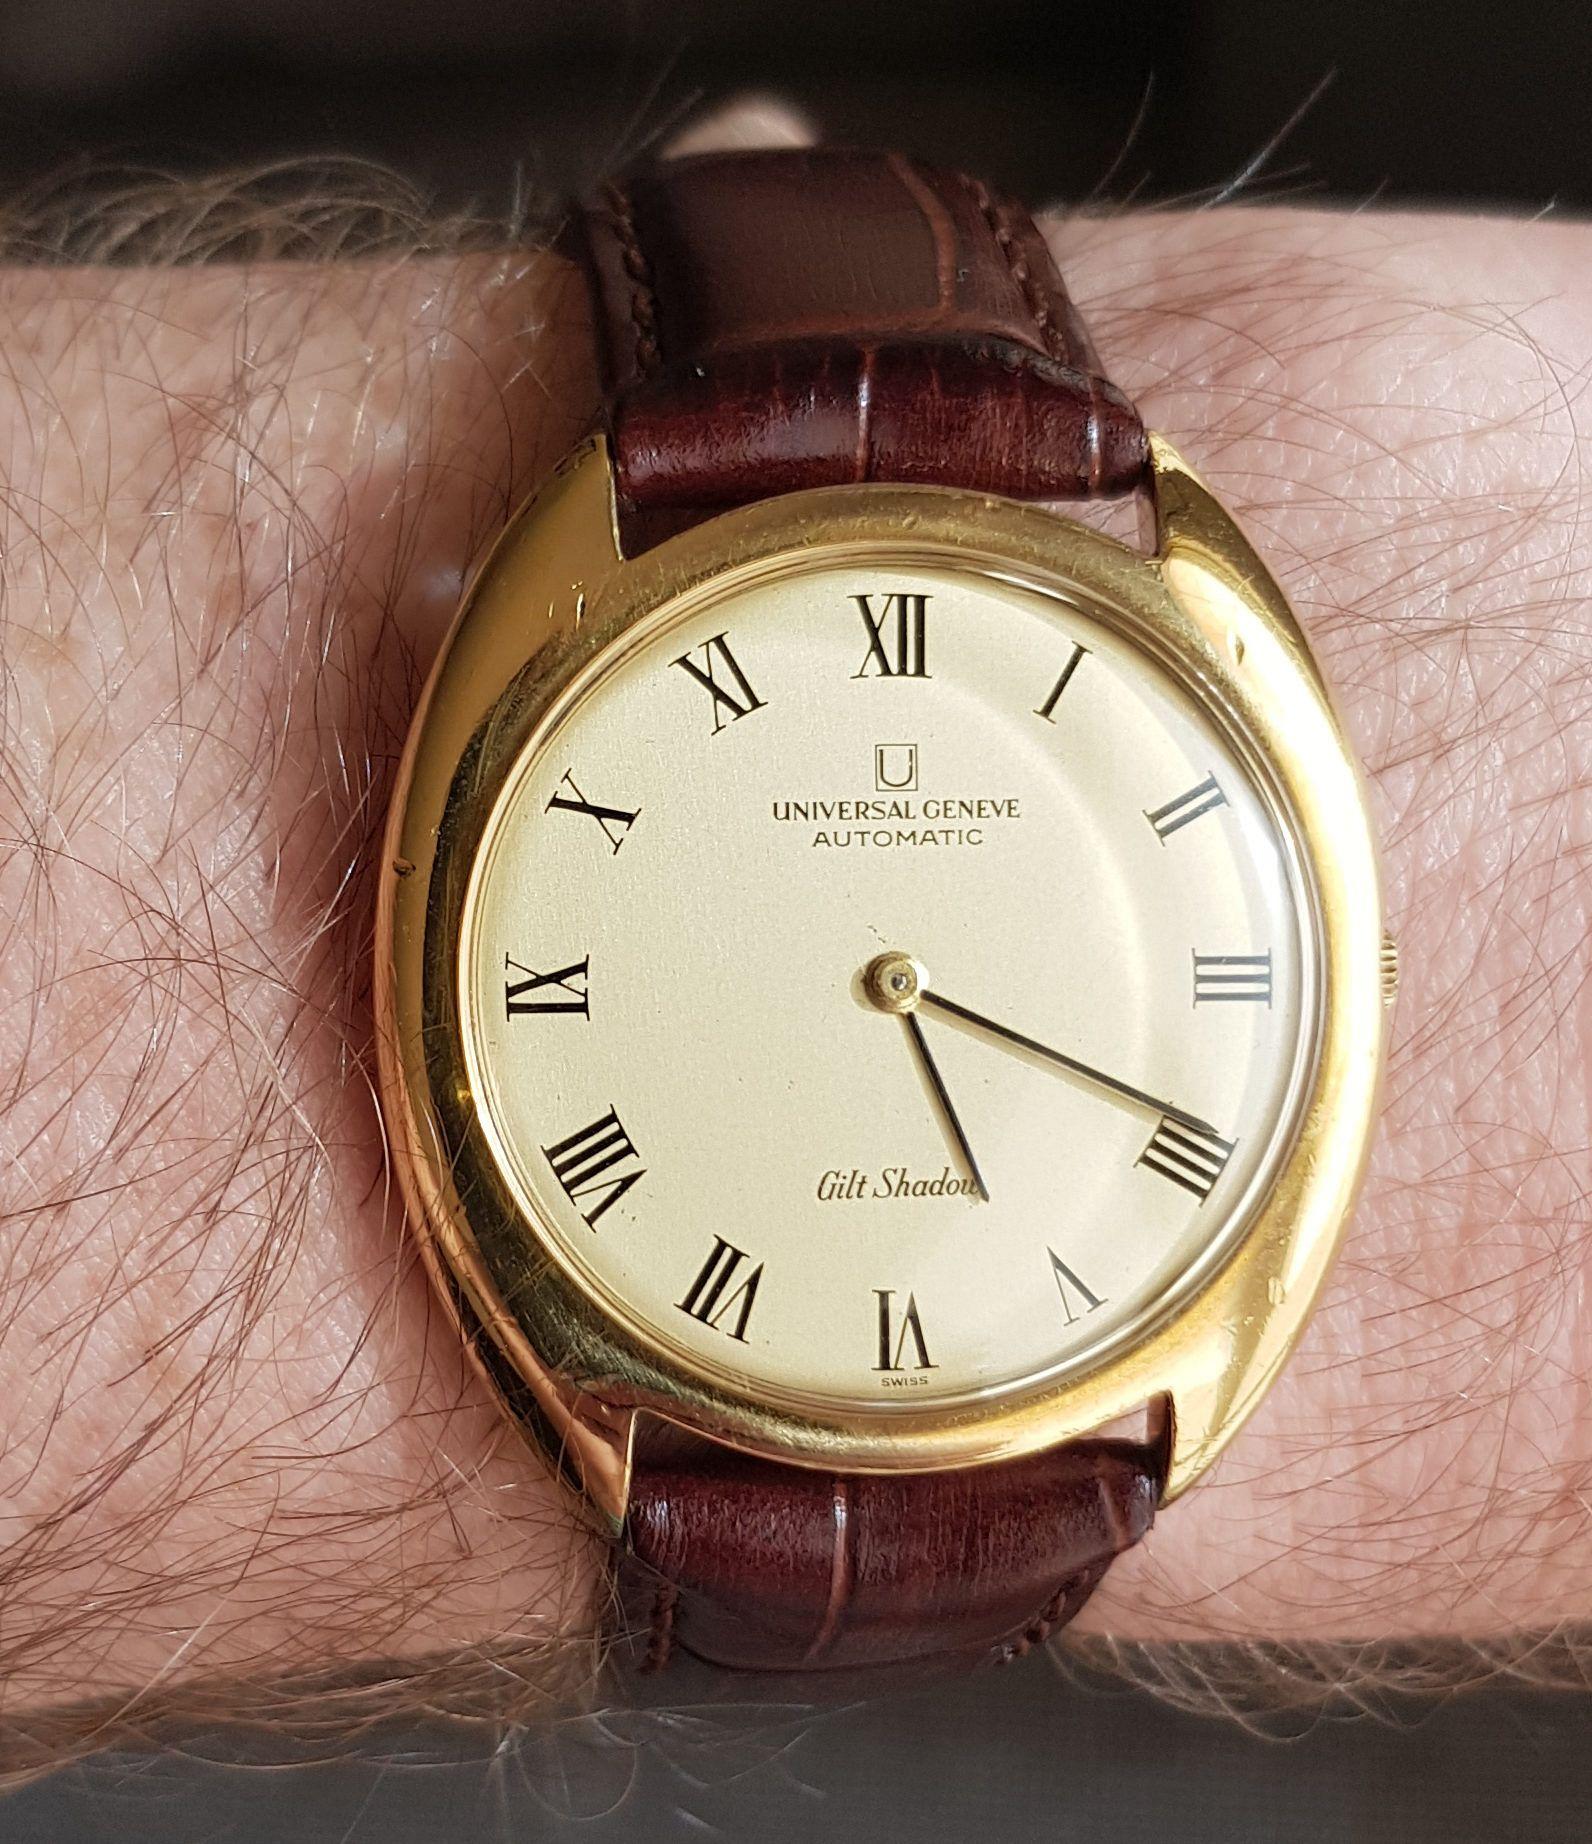 Weekend watch spotting with JR vintage